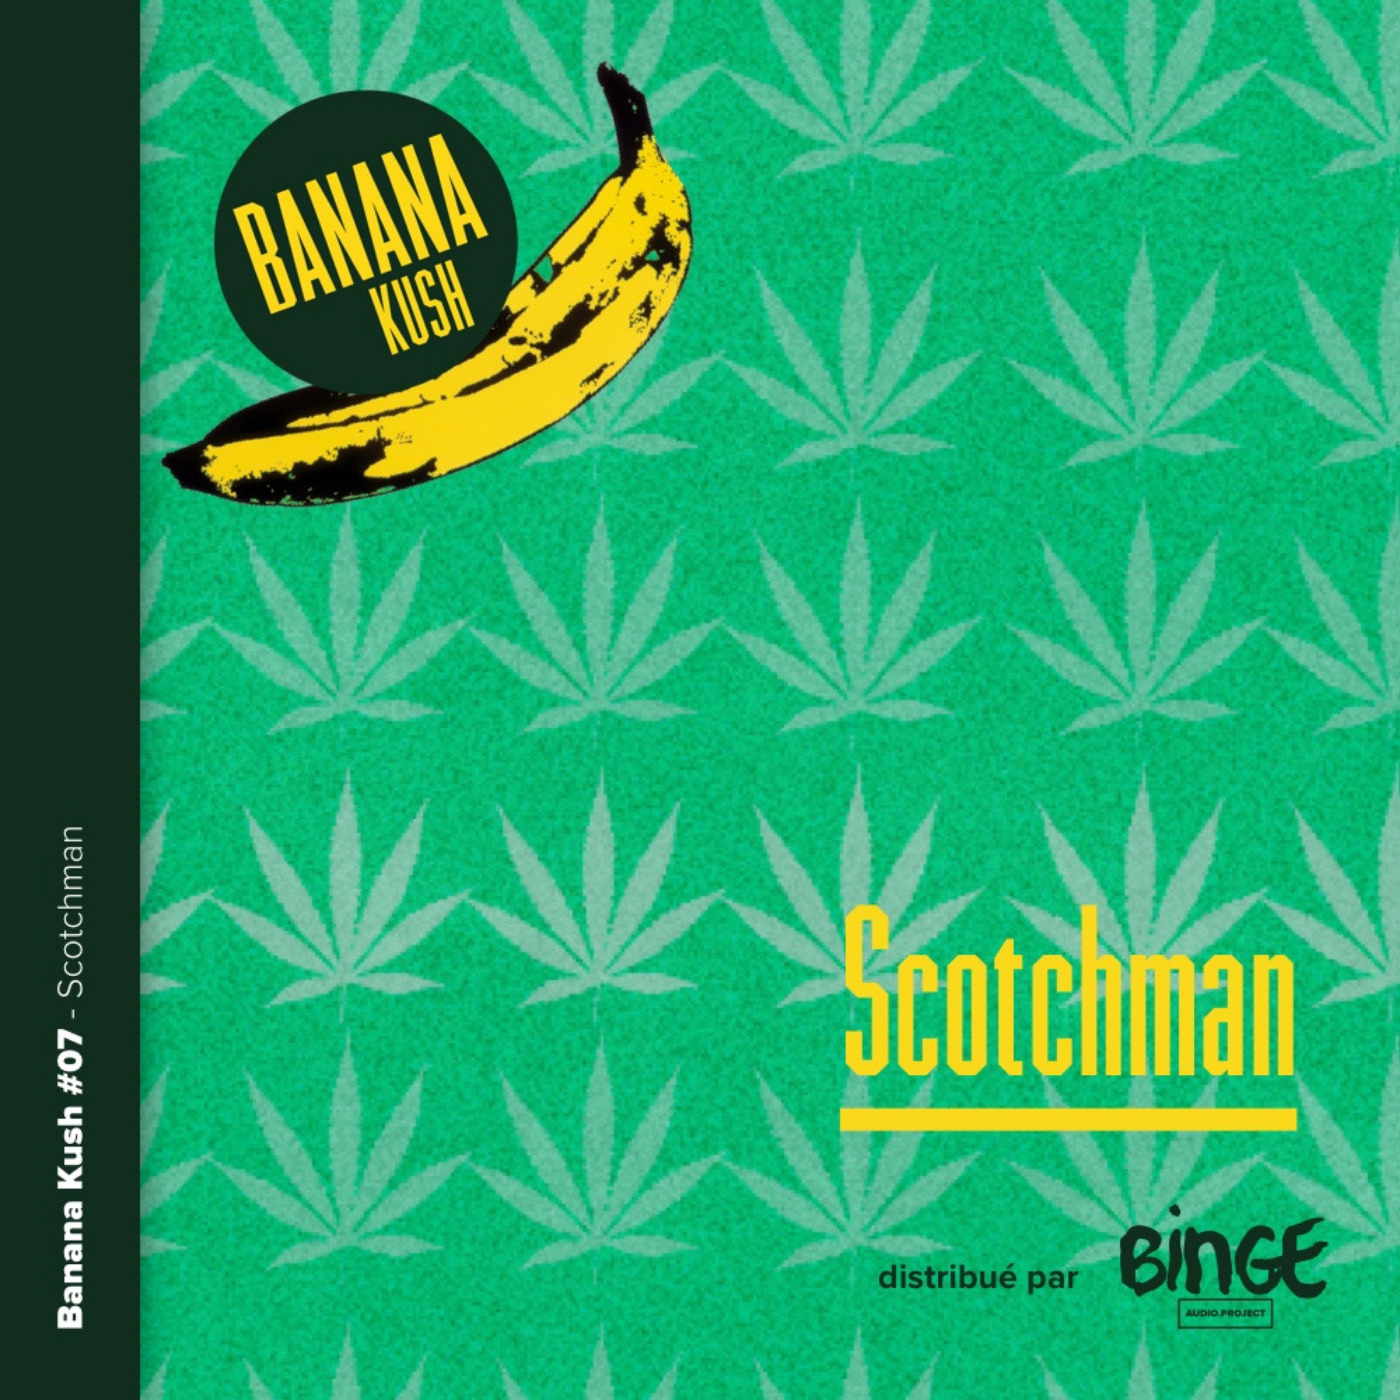 #07 - Spéciale cuisine avec Scotchman